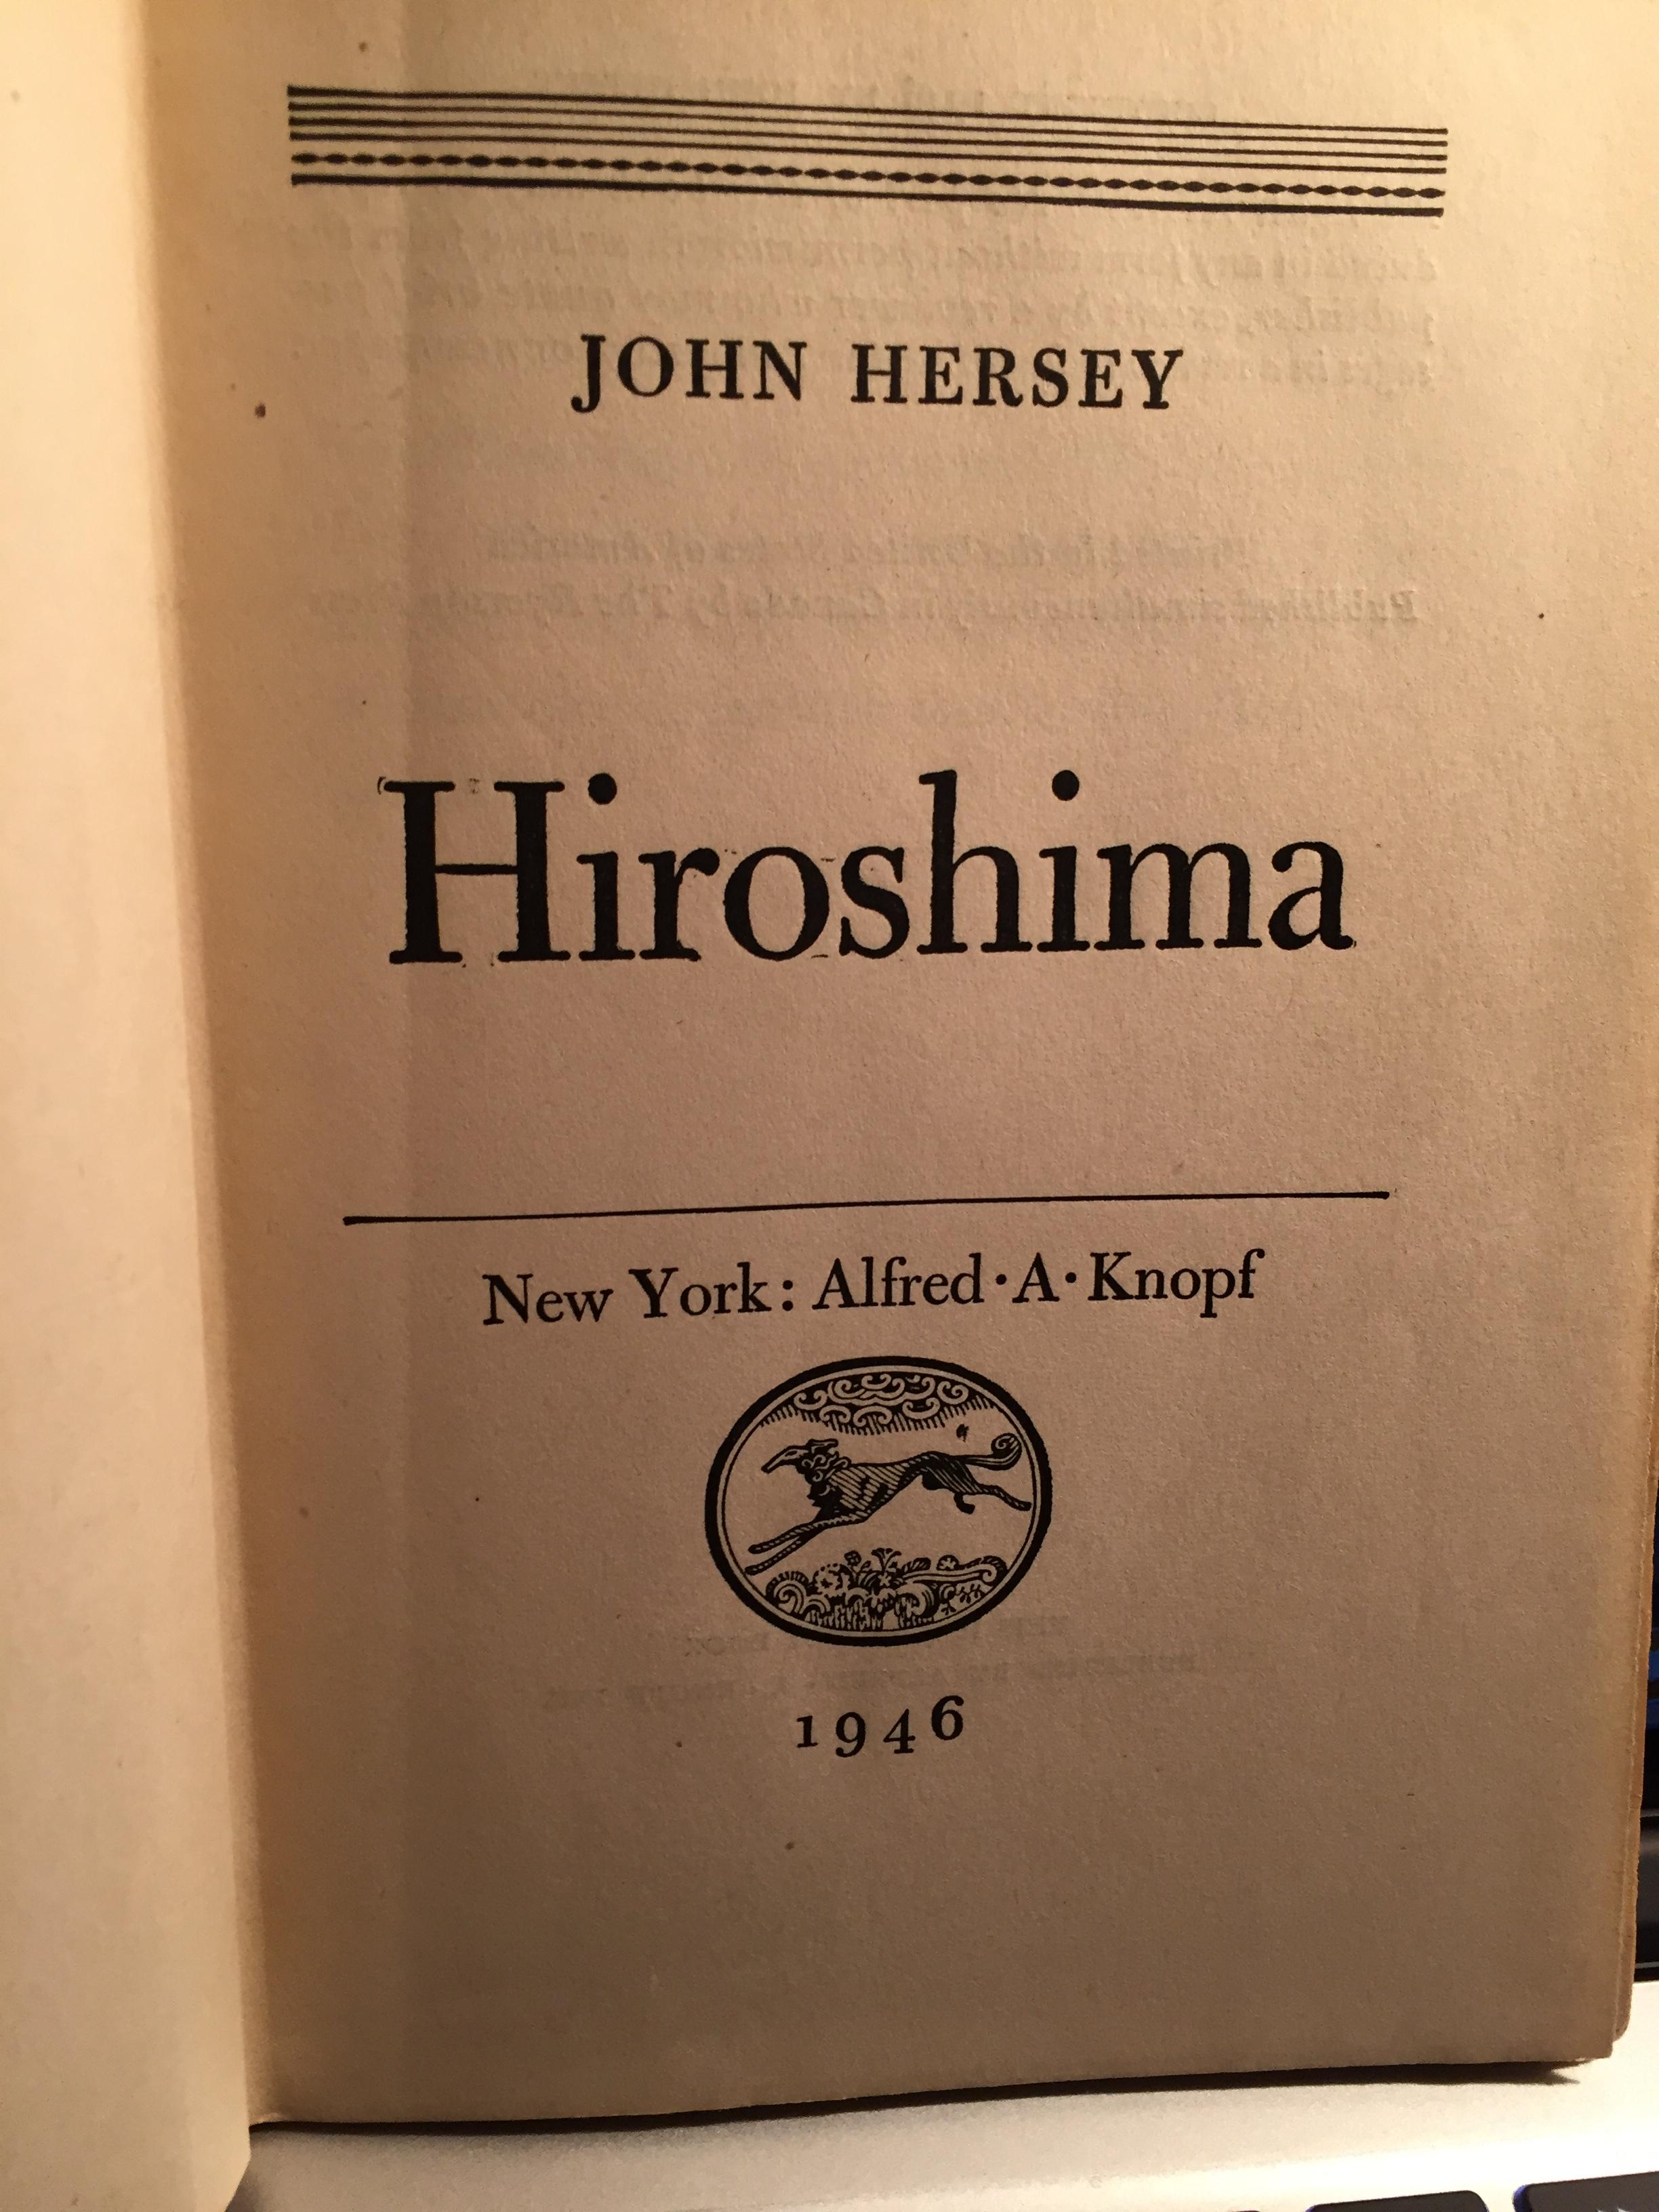 Hiroshima, John Hersey.JPG